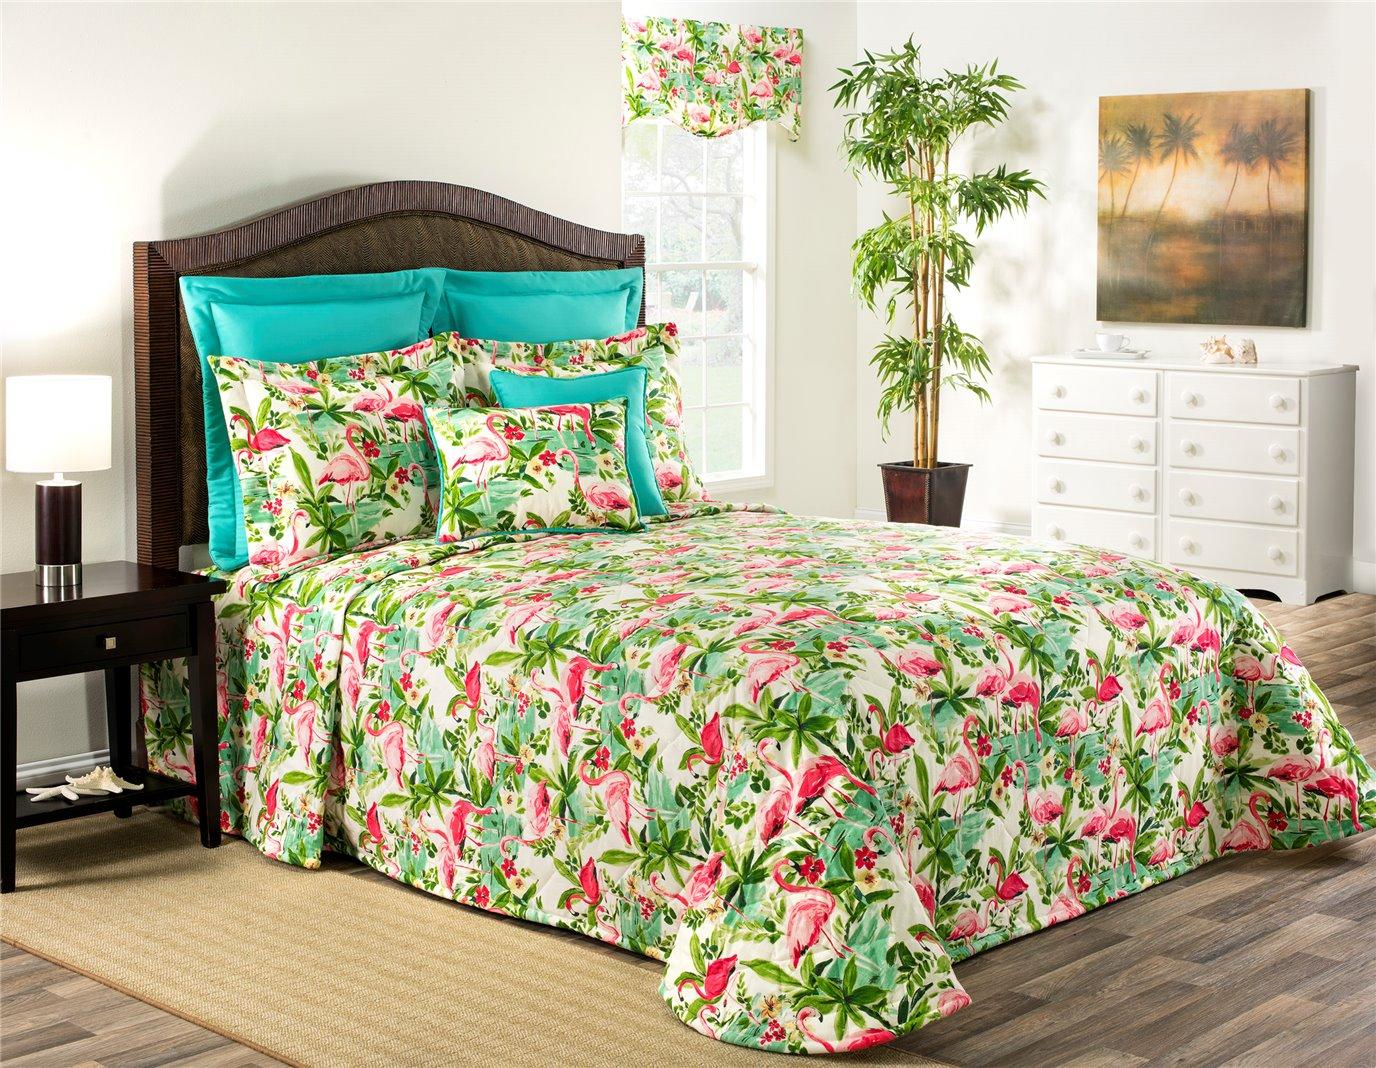 Floridian Flamingo Full Bedspread